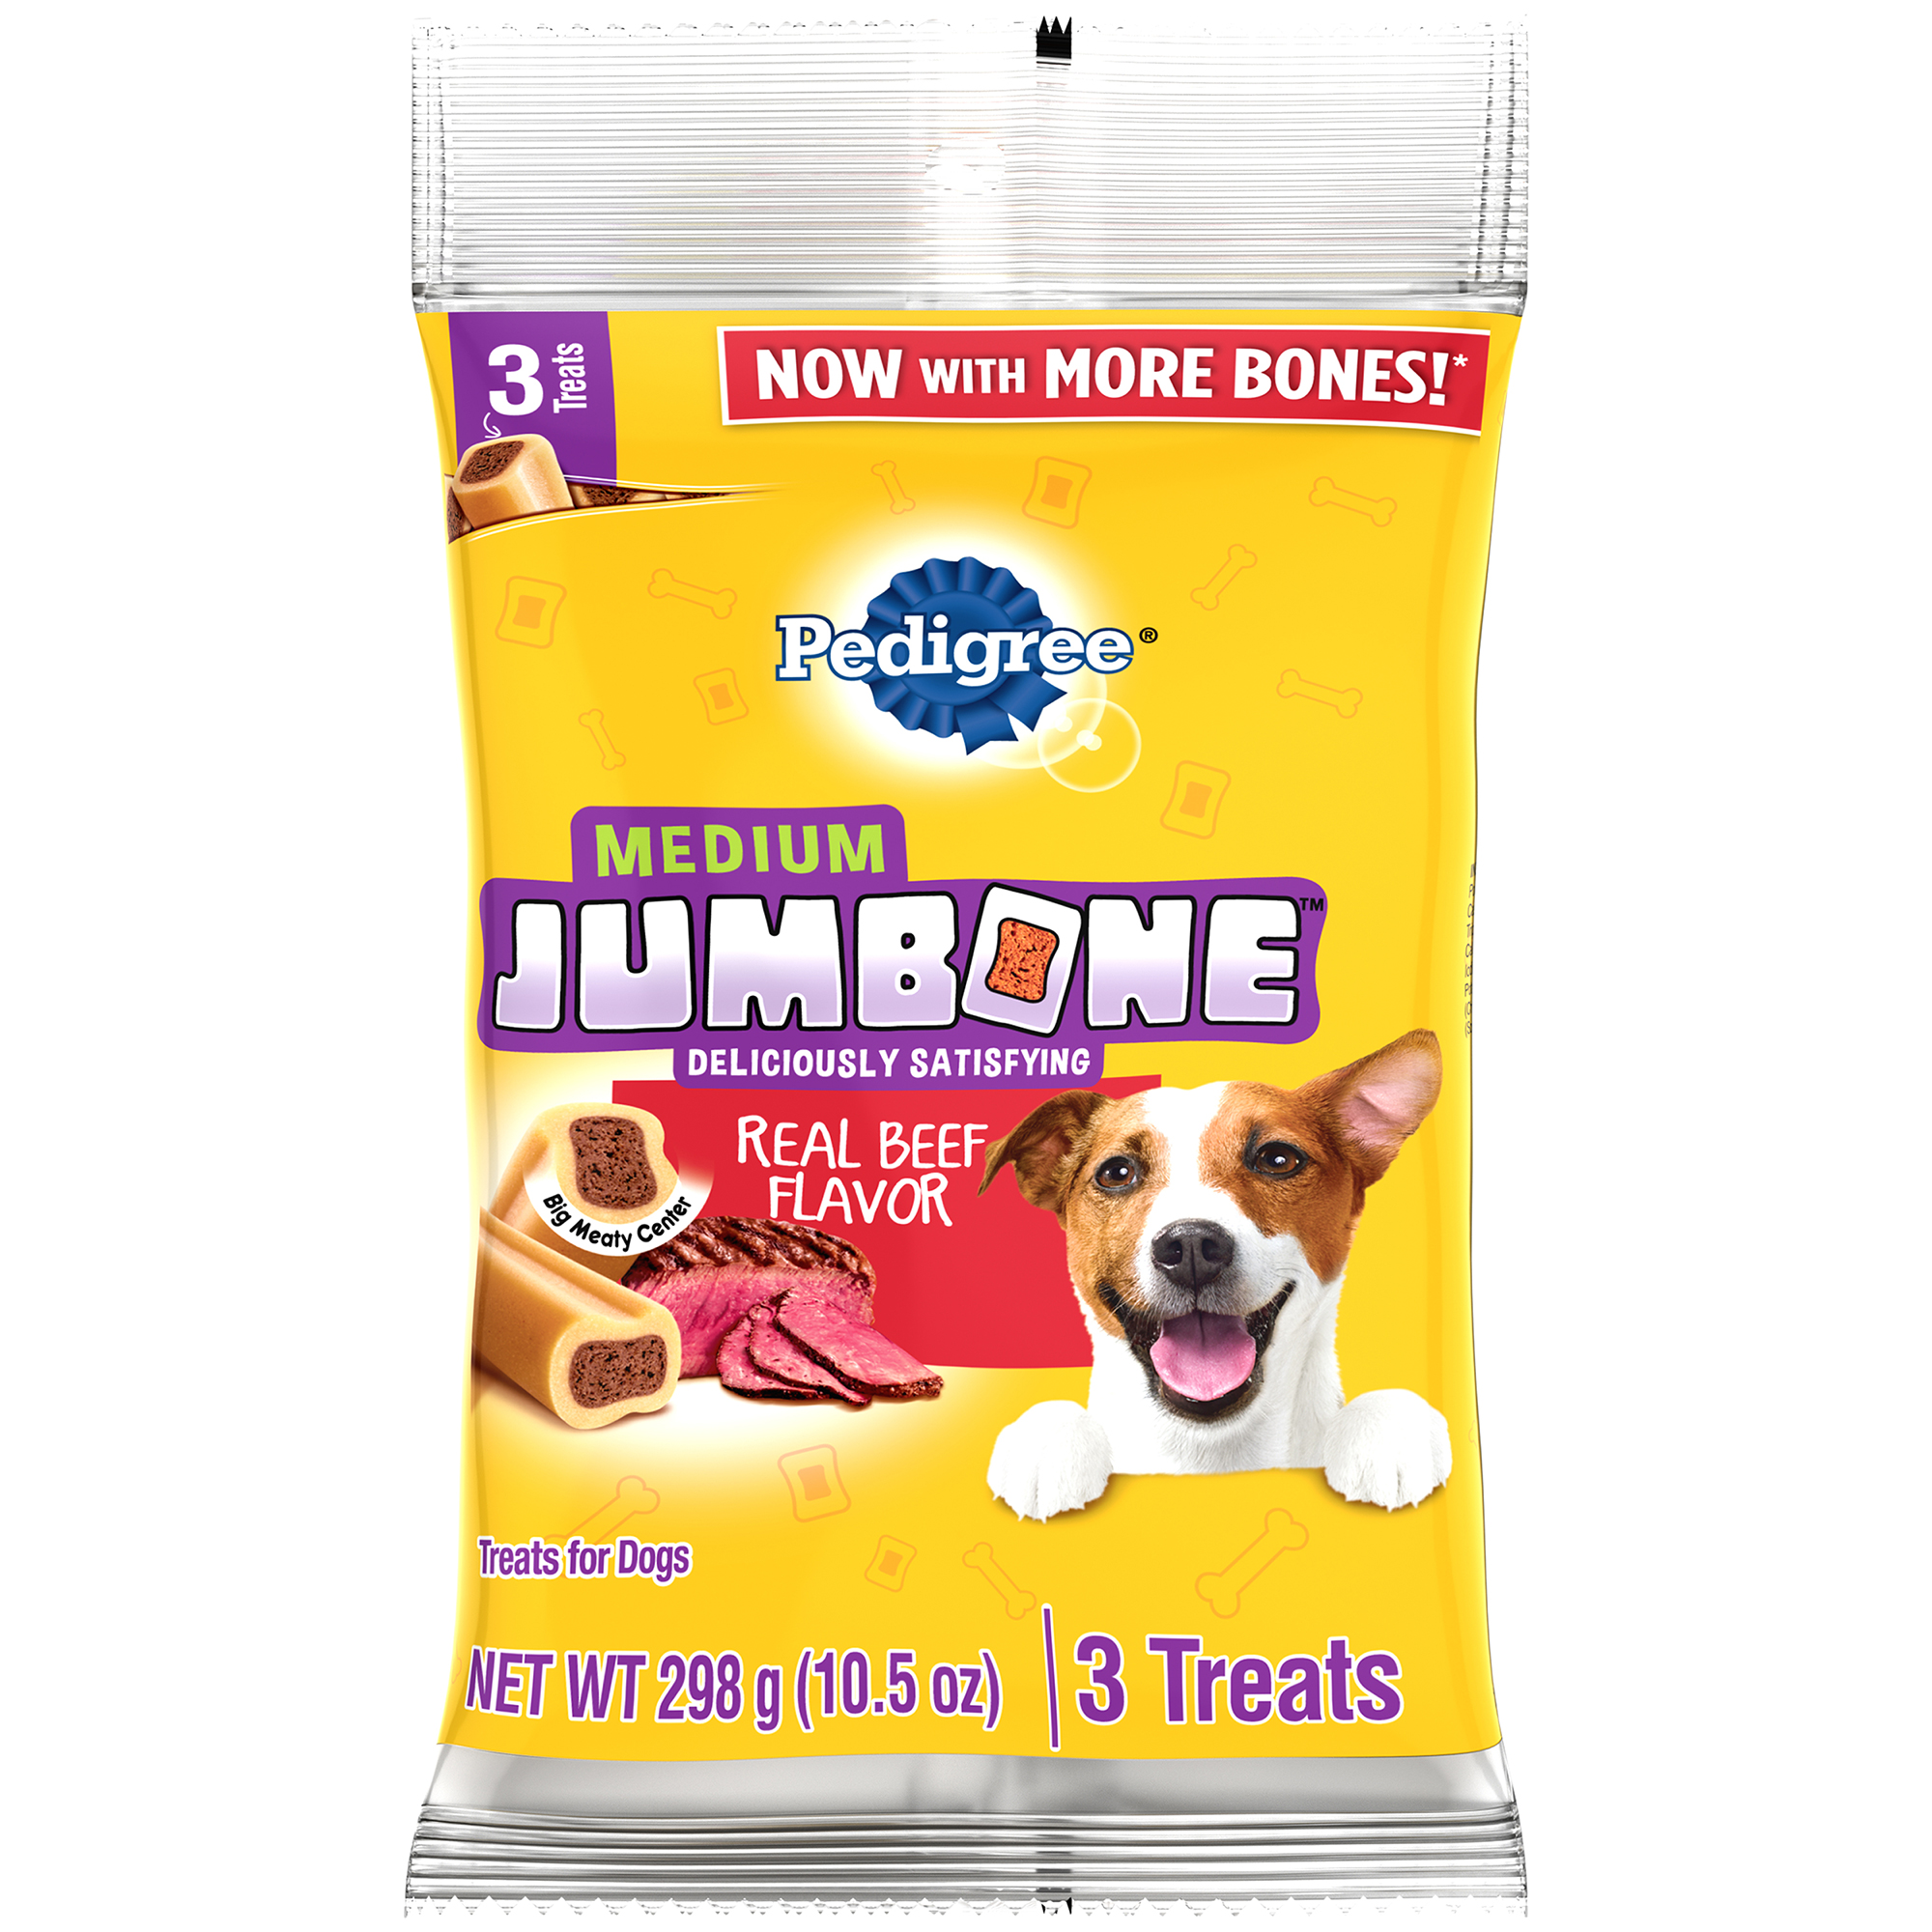 Pedigree Jumbone Real Beef Flavor Medium Dog Treats - 10.5 Ounces (3 Treats)